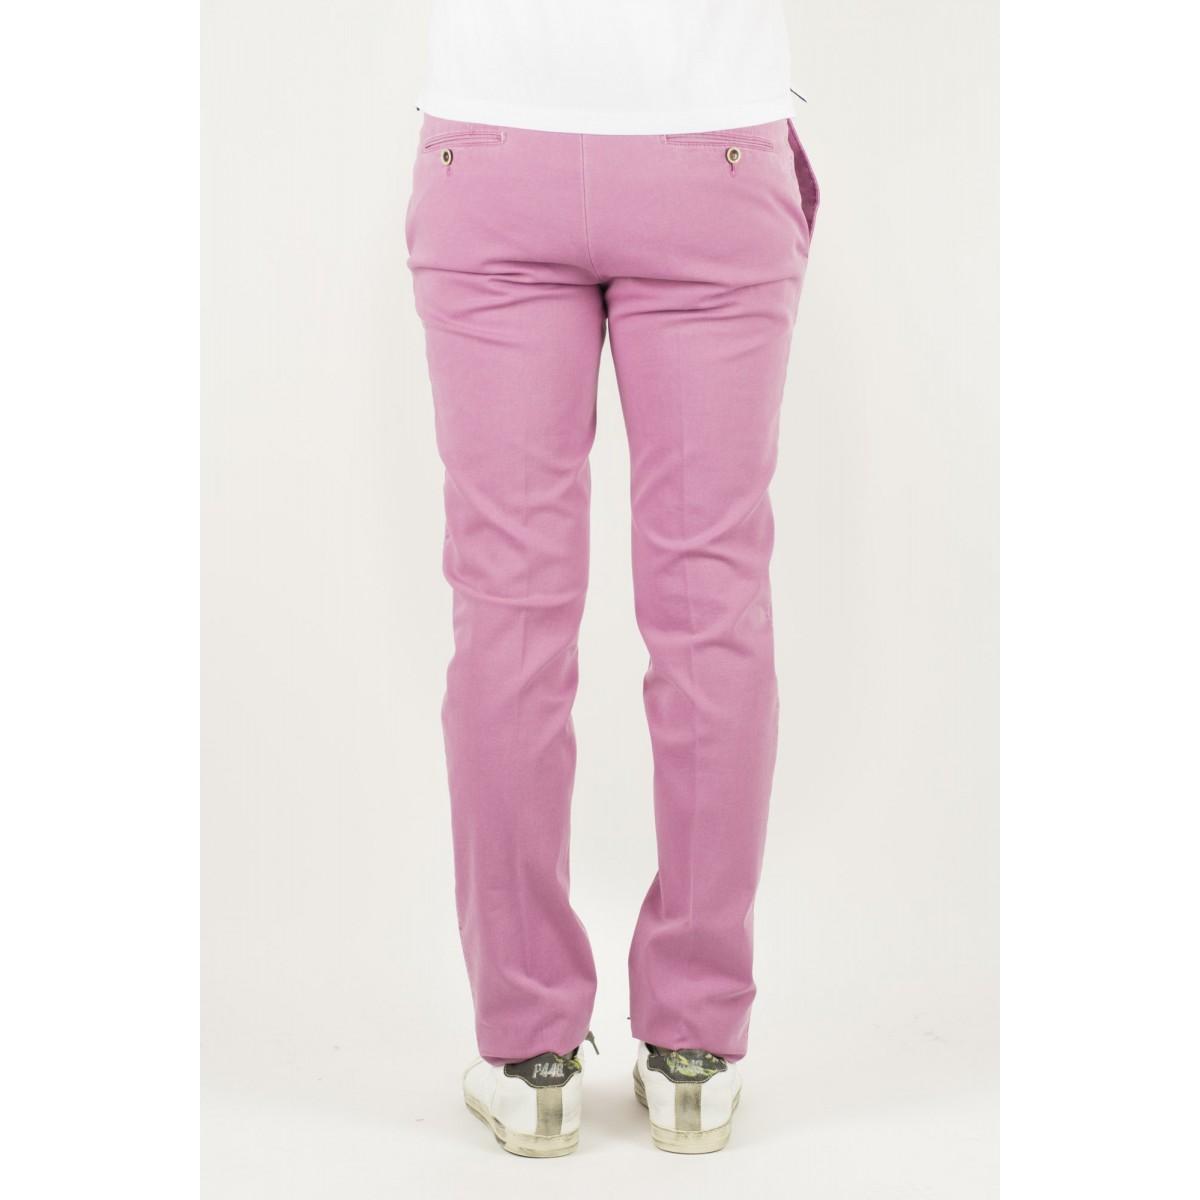 Trousers Pt 01 Man - Cpvlsb Sr50 0600